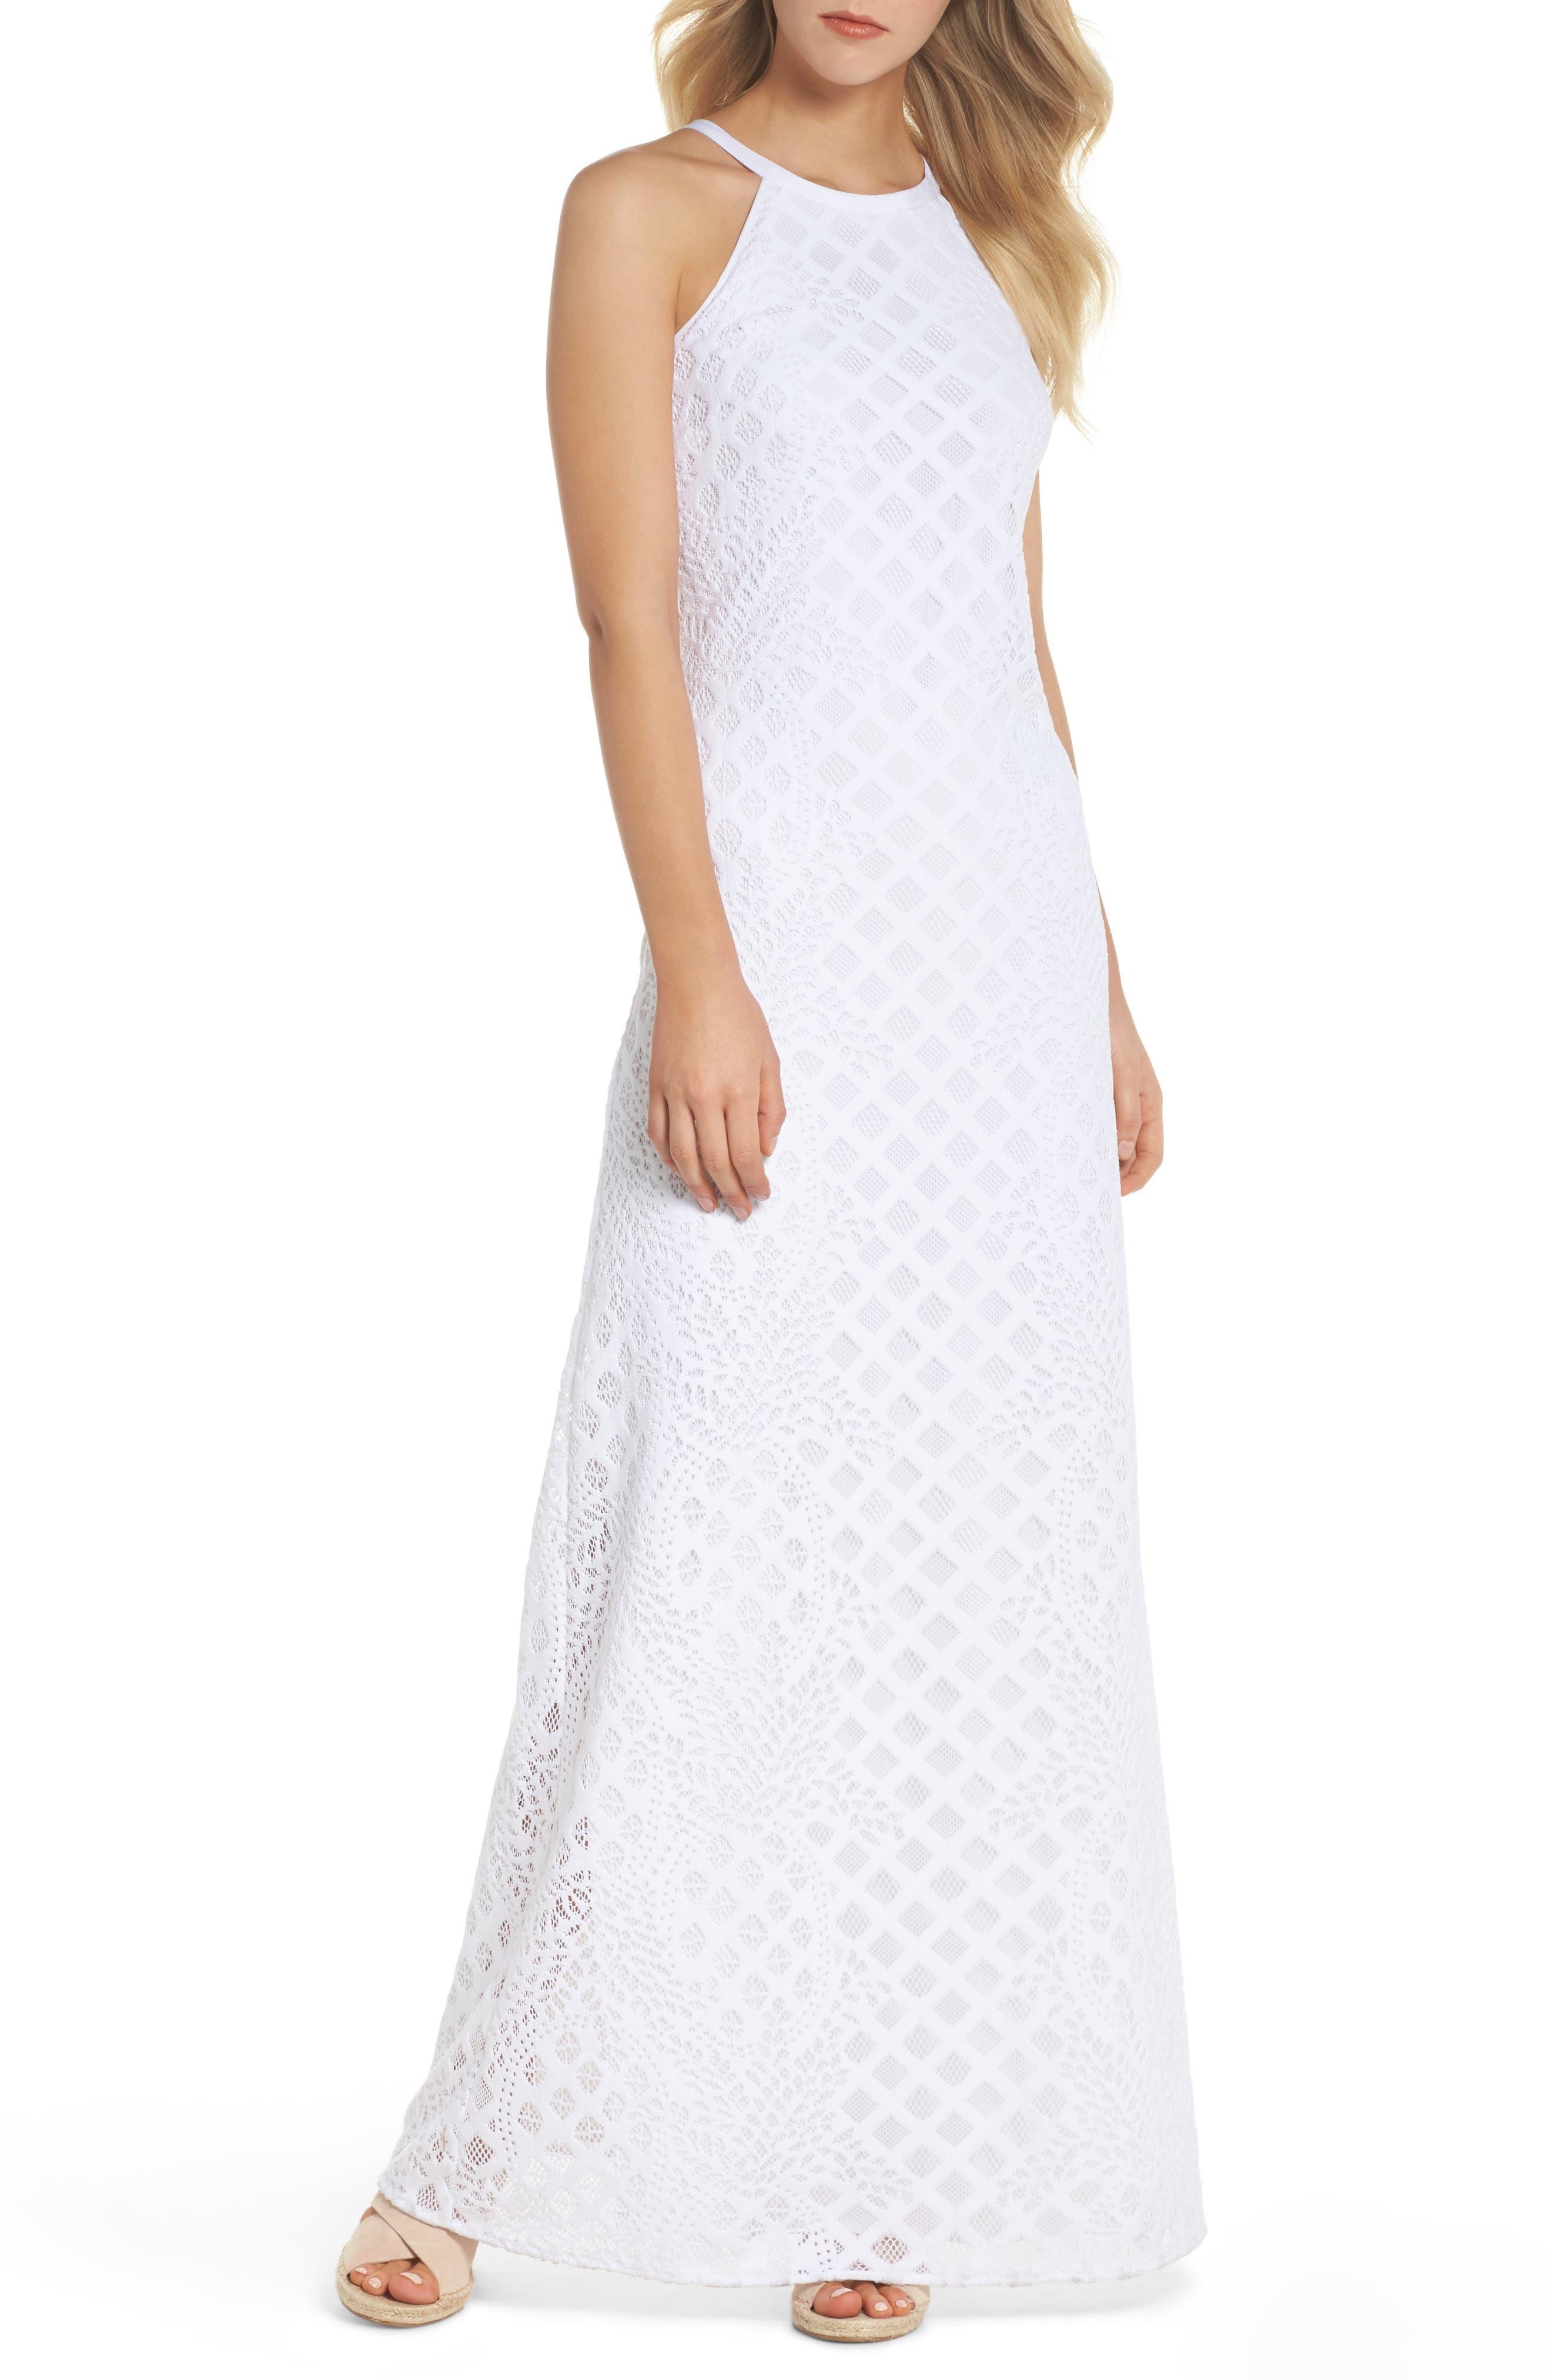 Pearl Maxi Dress,                             Main thumbnail 1, color,                             100